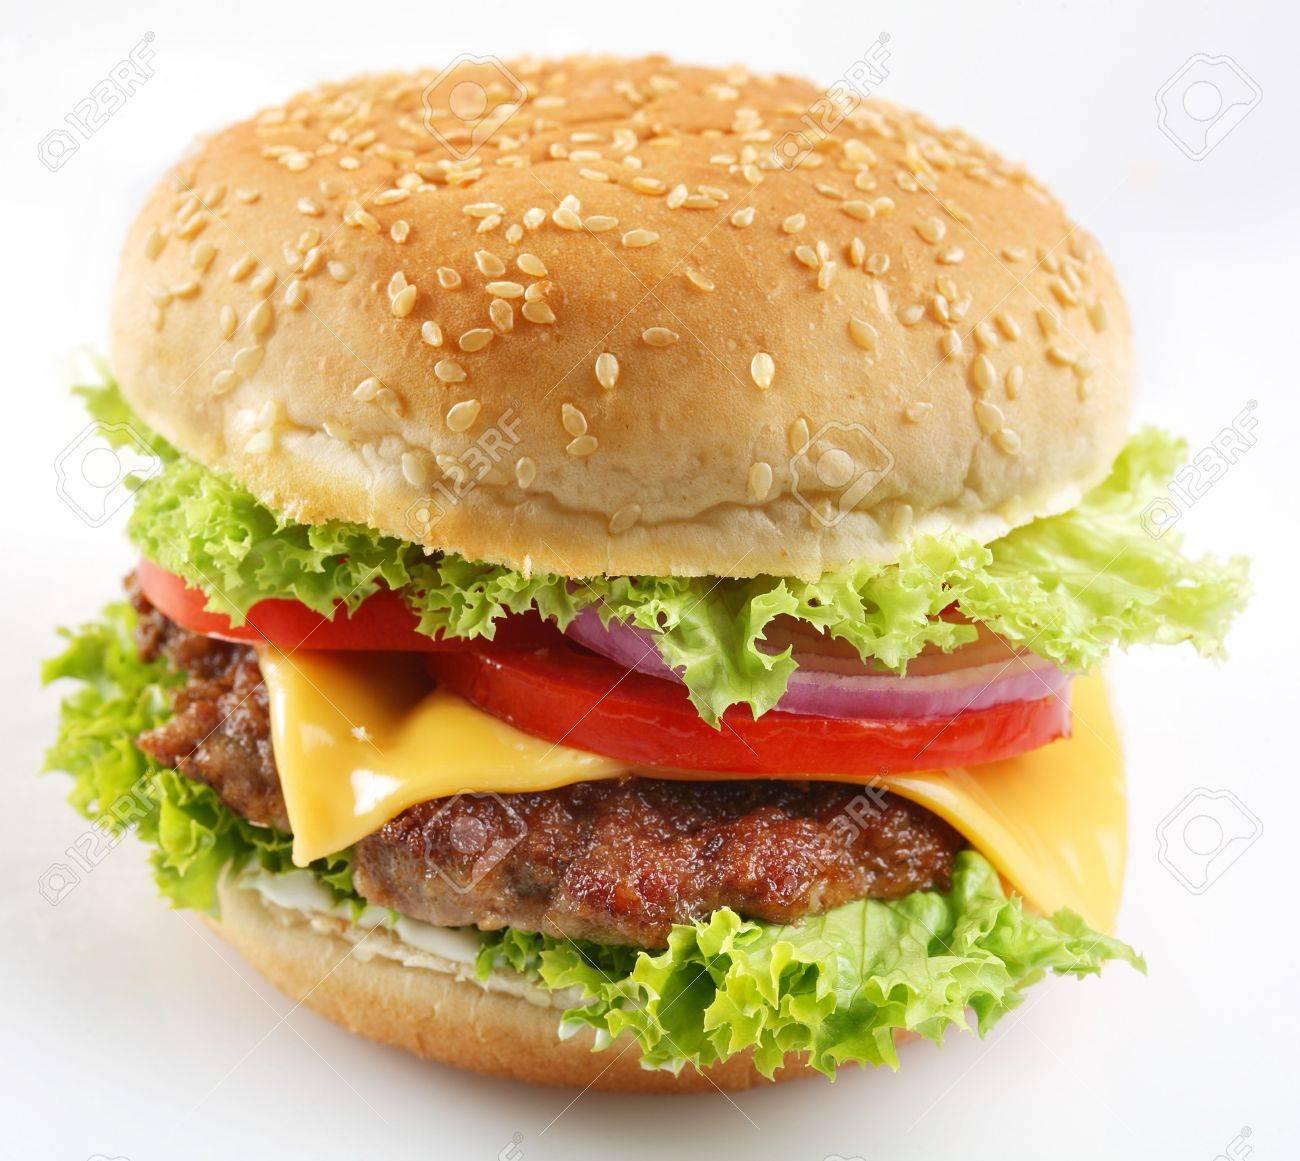 Cheeseburger on a white background Stock Photo - 6305920